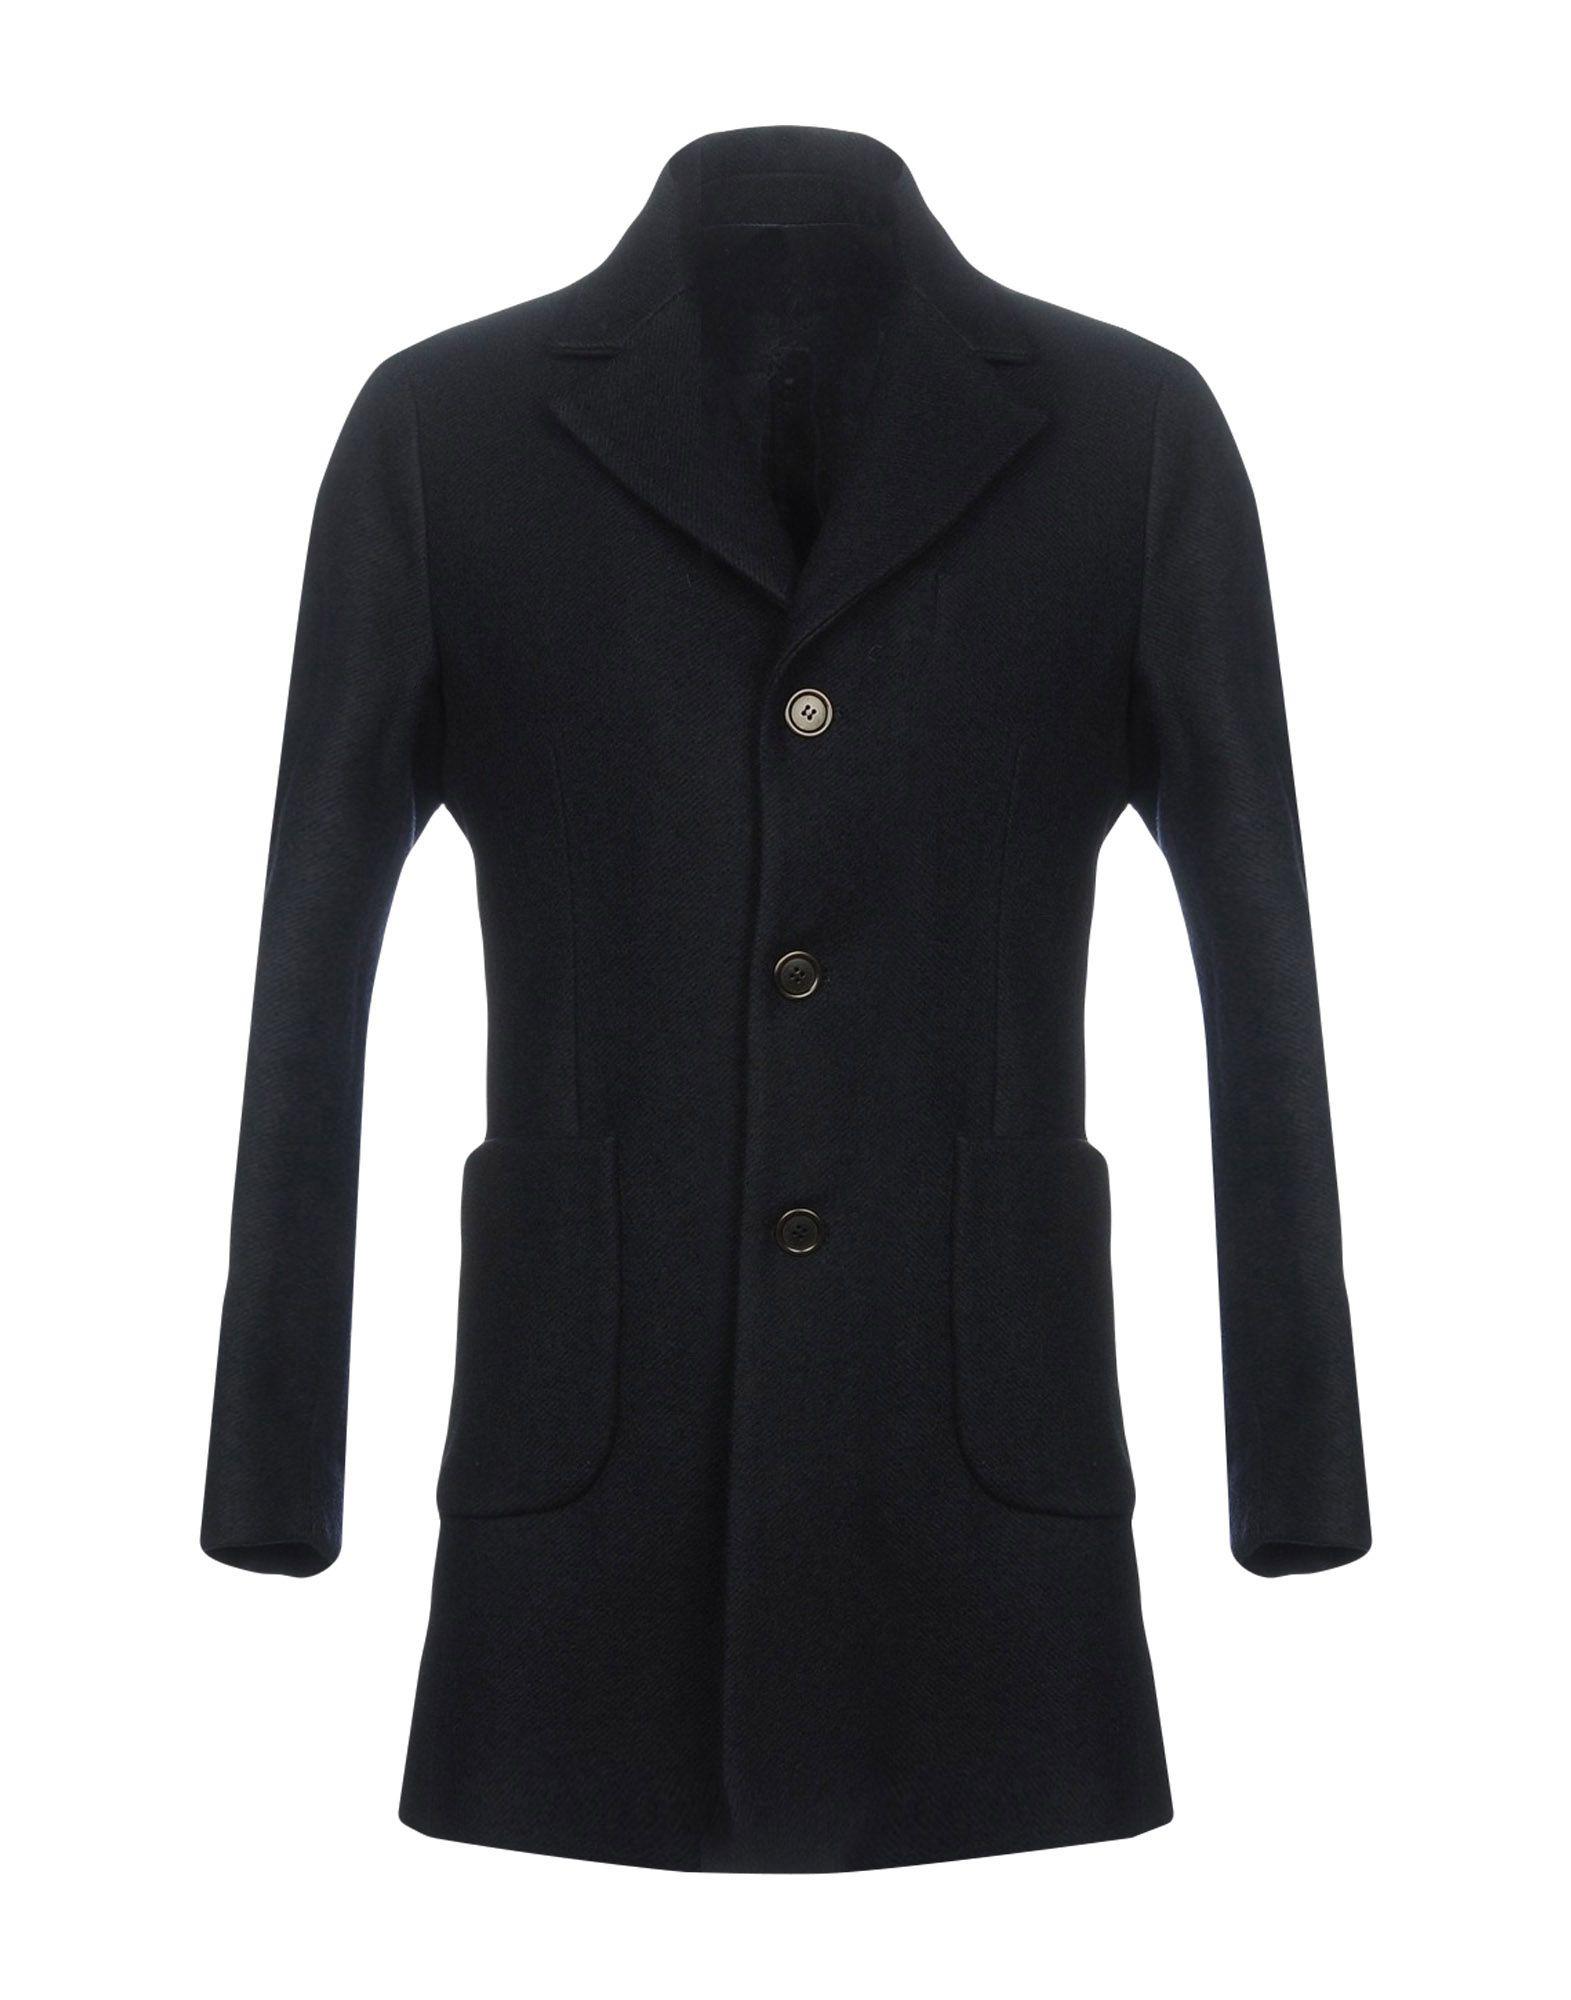 Cappotto Authentic Original Vintage Style Uomo - Acquista online su